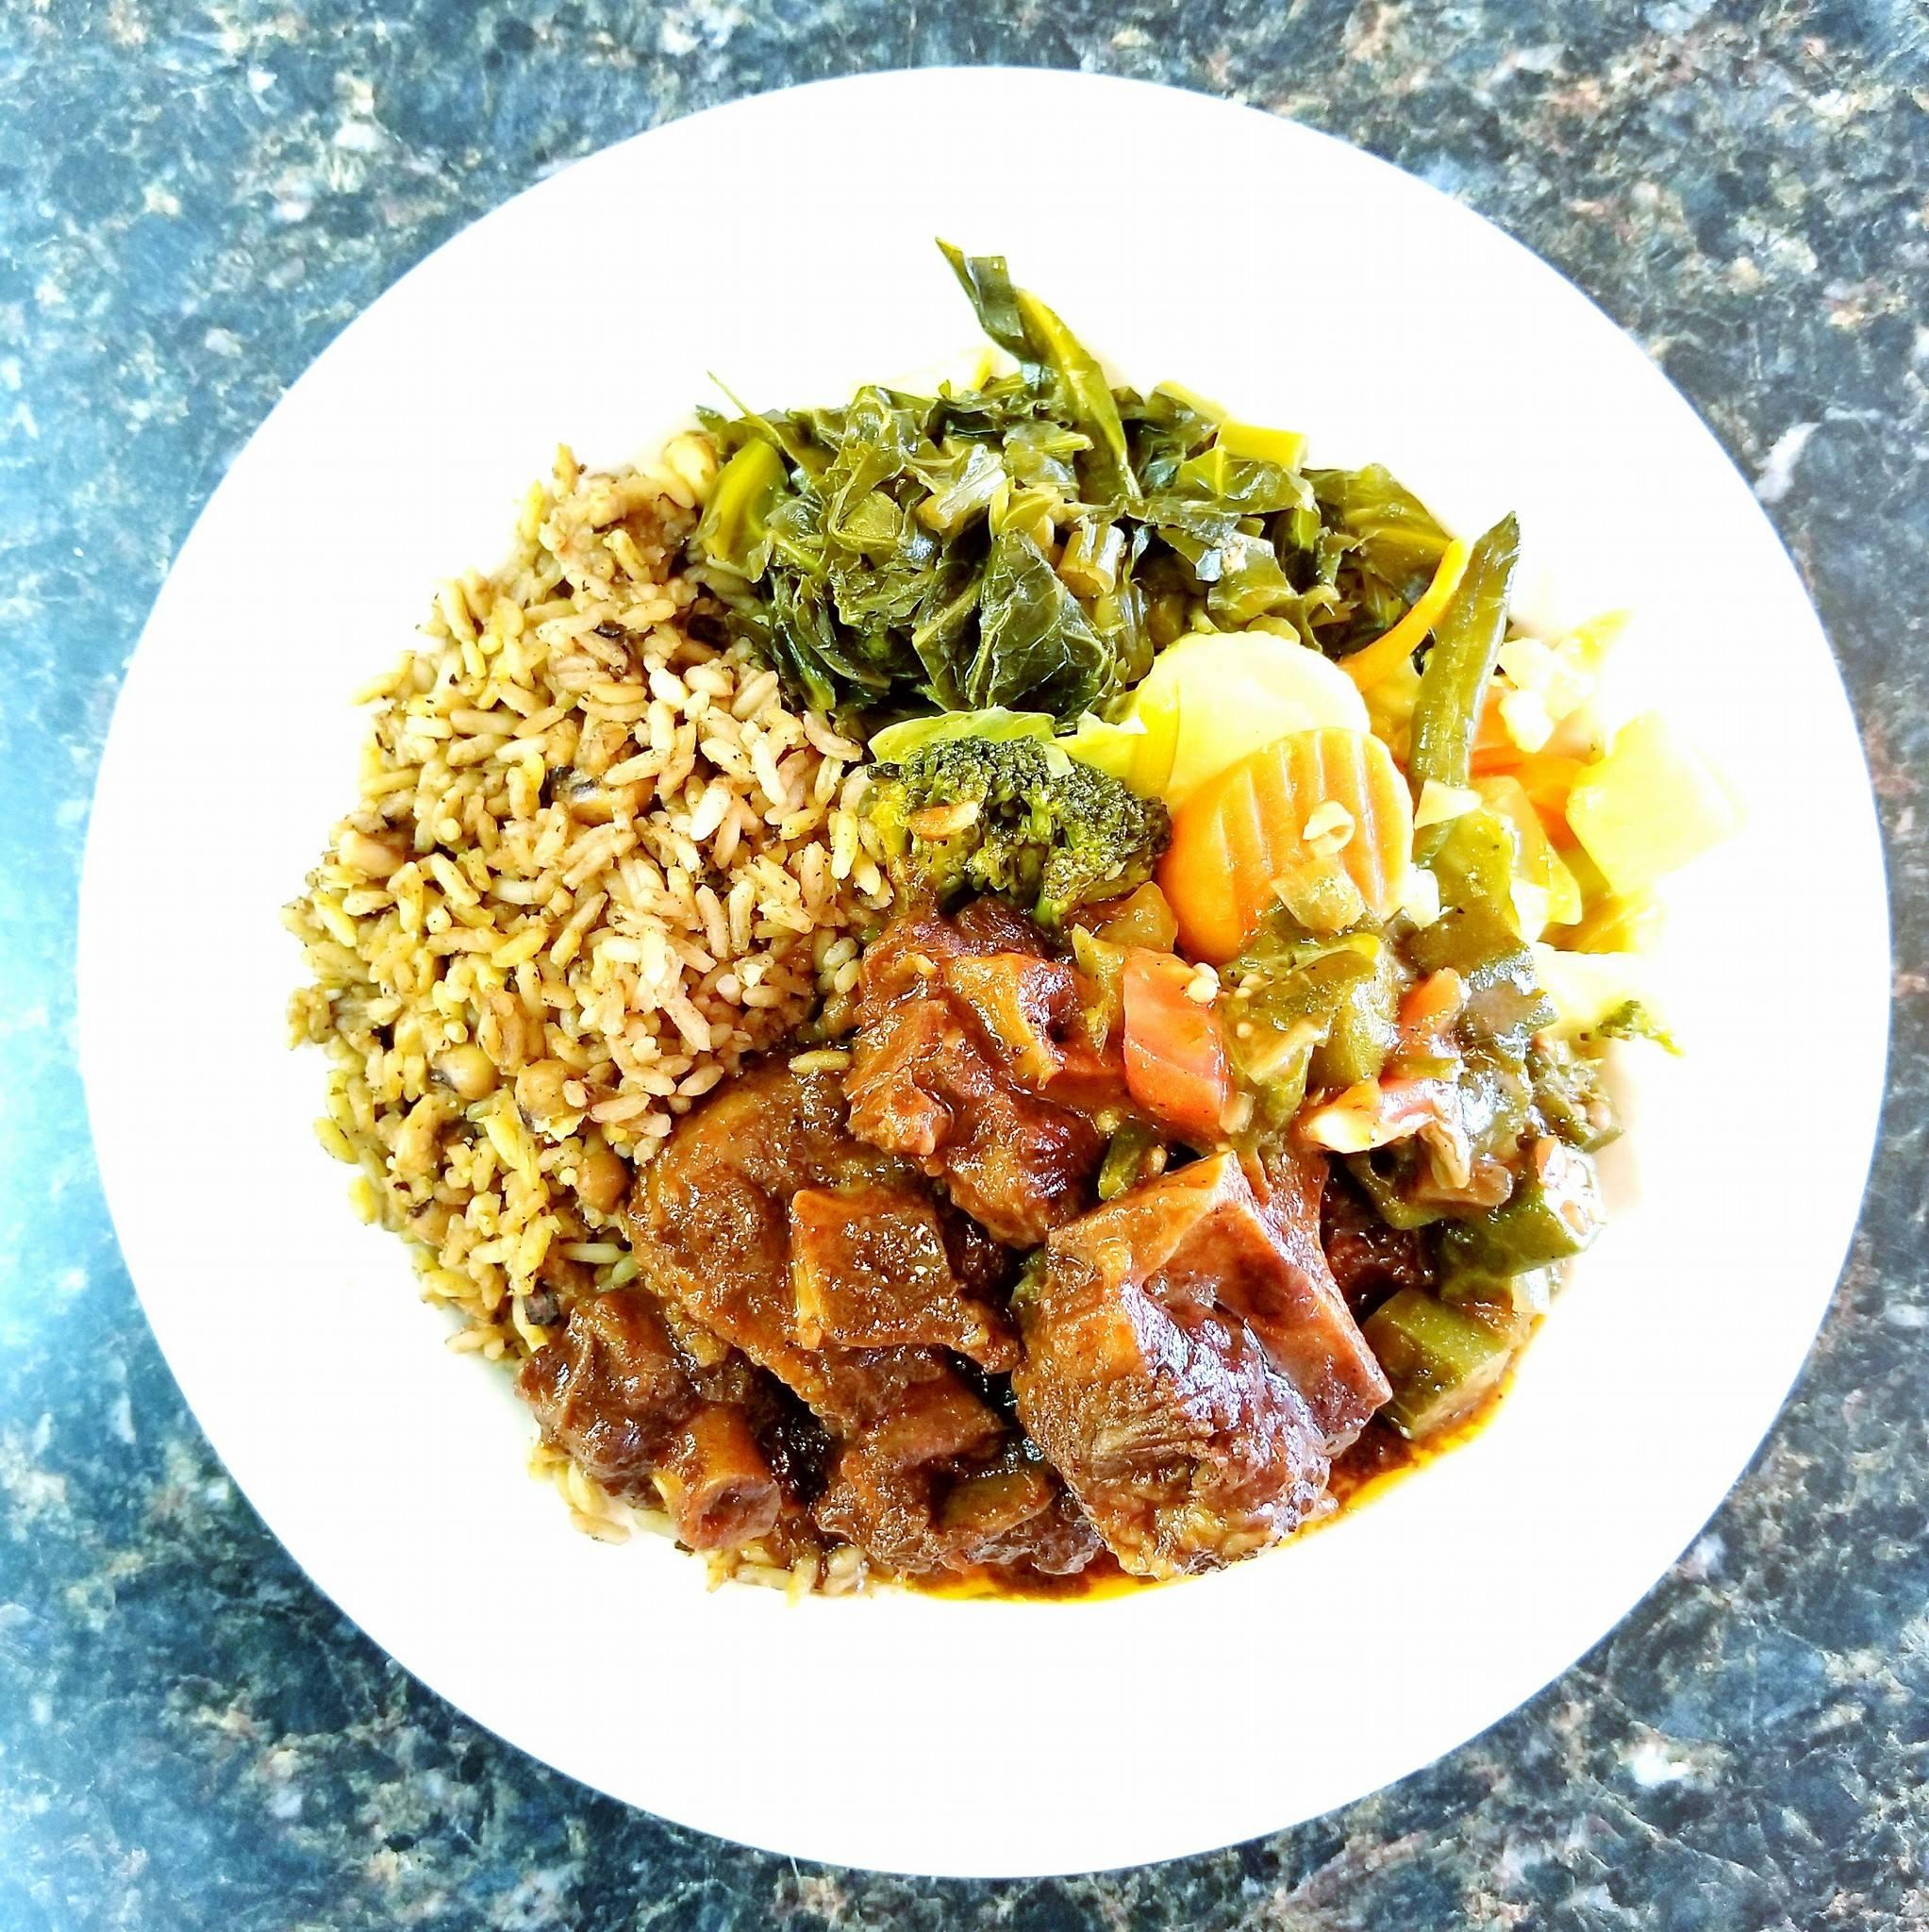 10 Bizarre Foods of the Caribbean | Sandals Blog